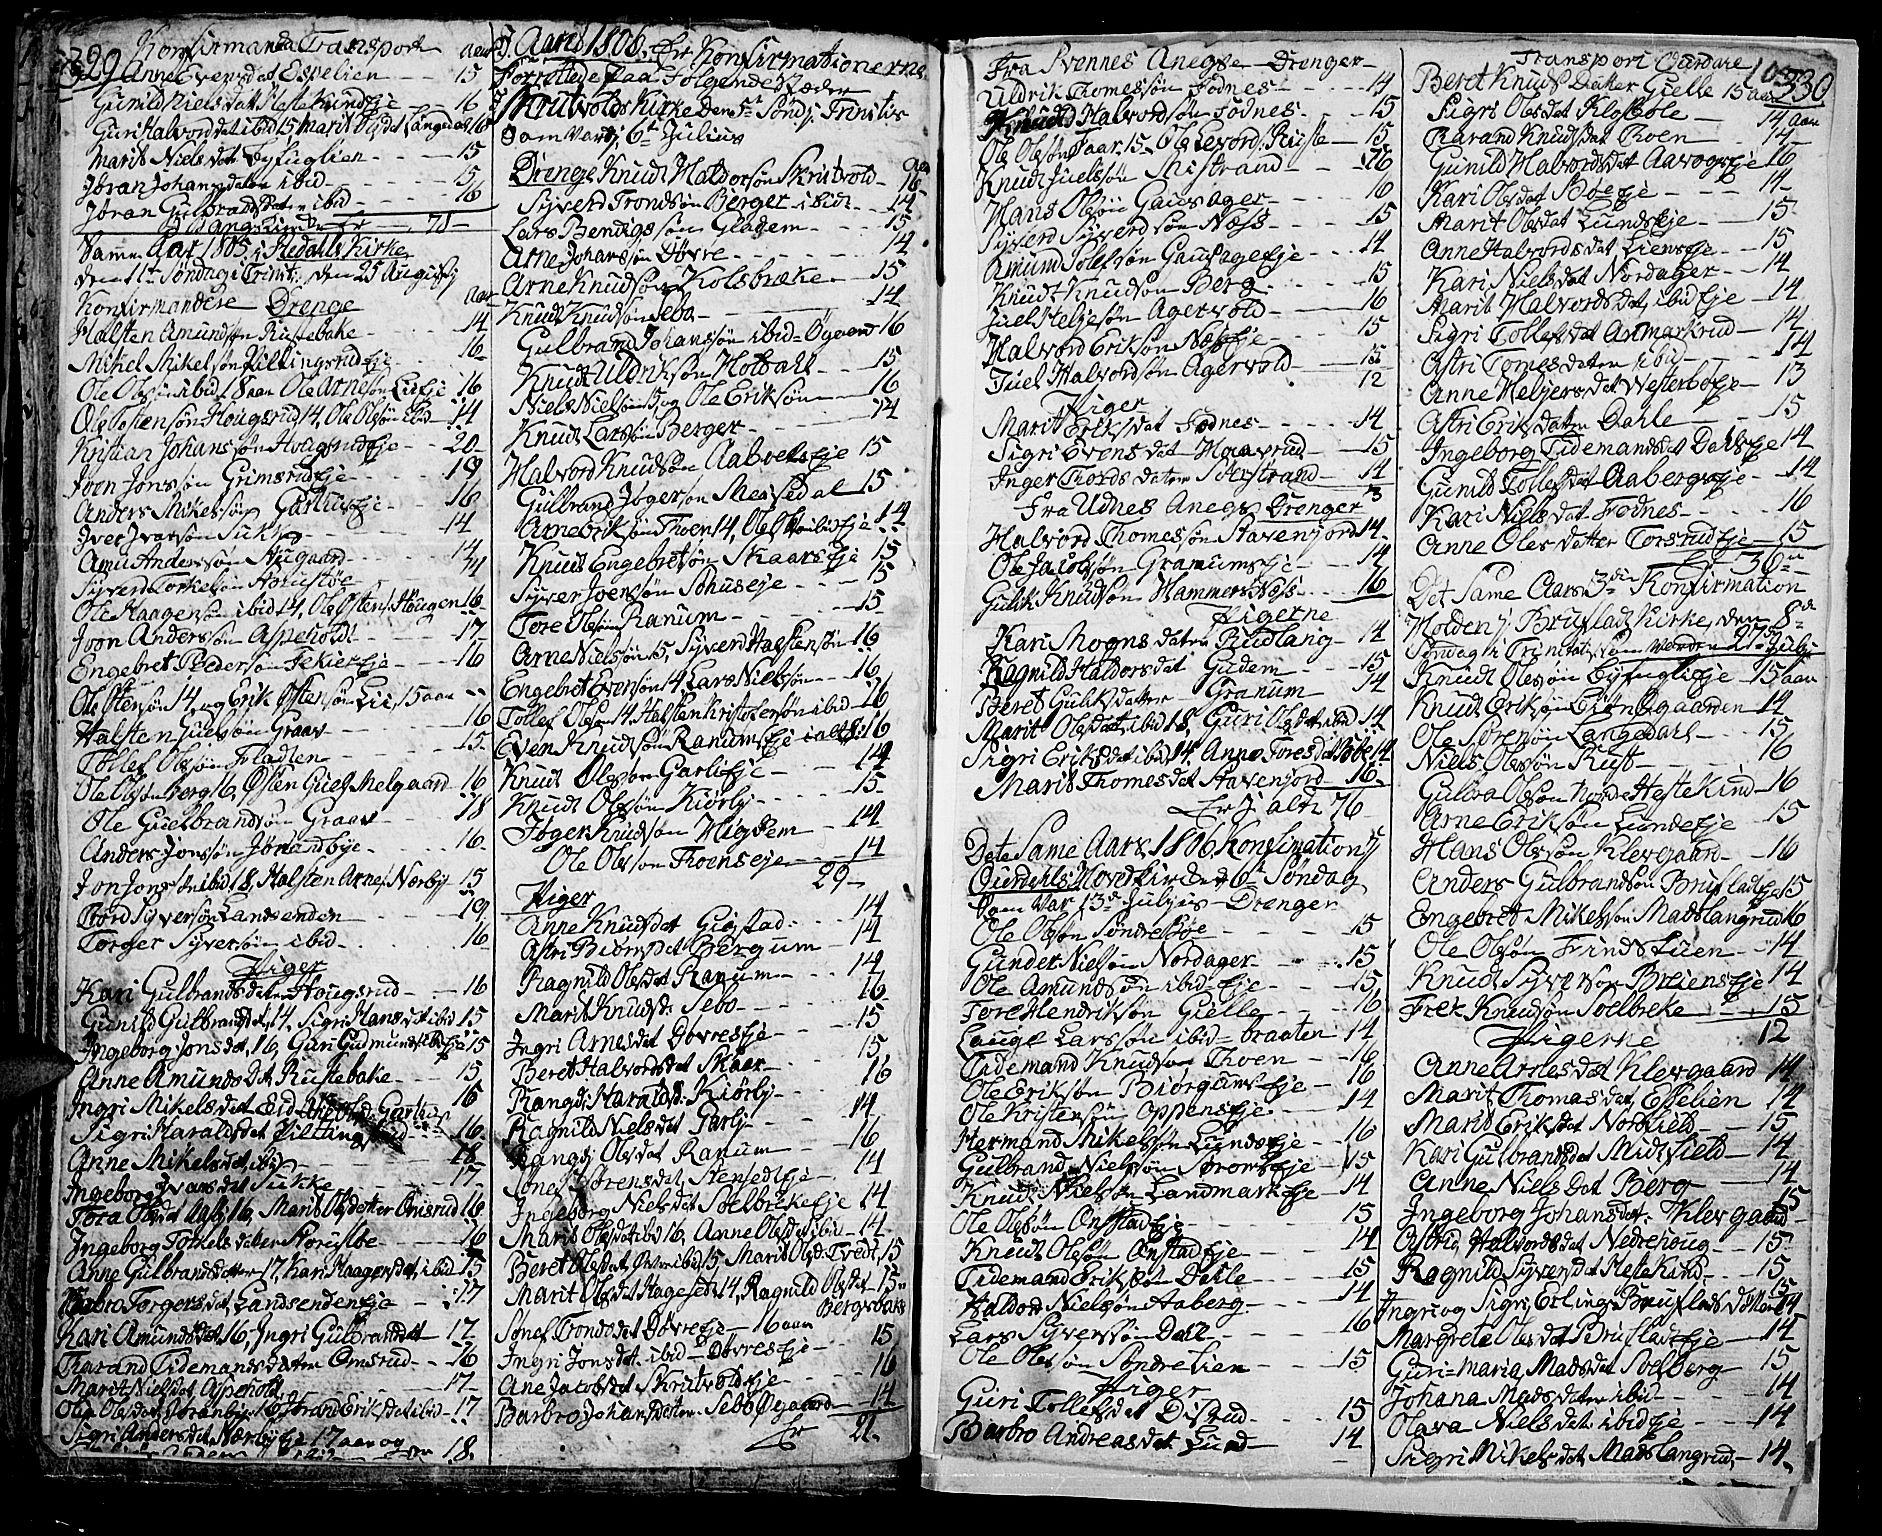 SAH, Aurdal prestekontor, Ministerialbok nr. 7, 1800-1808, s. 105